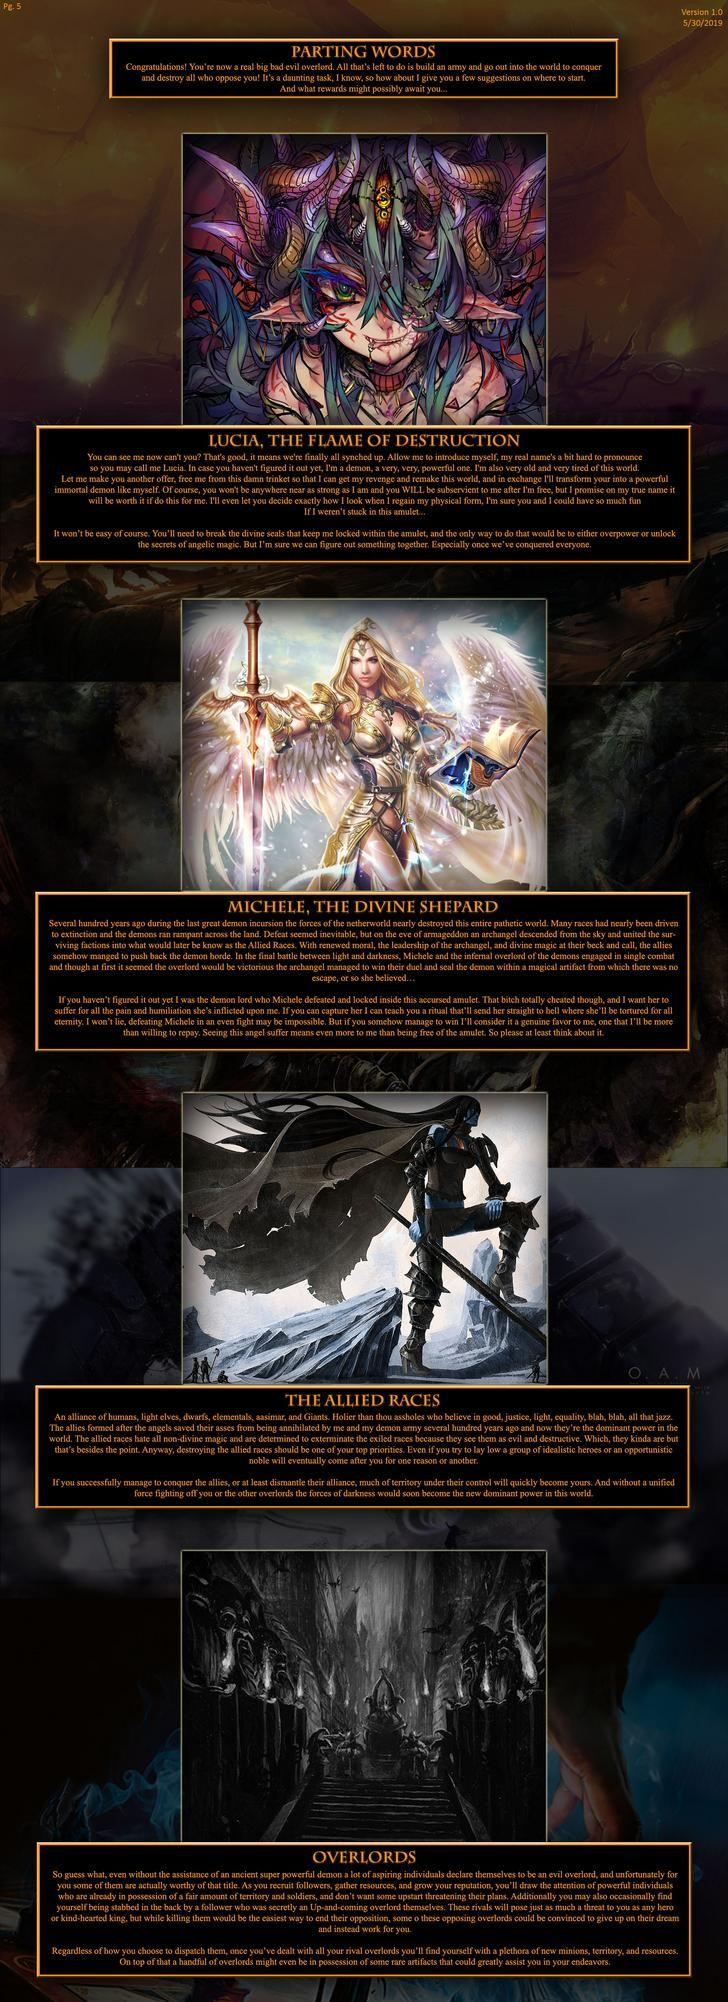 Big Evil Magical Overlord (/tg/) Cyoa, Cyoa games